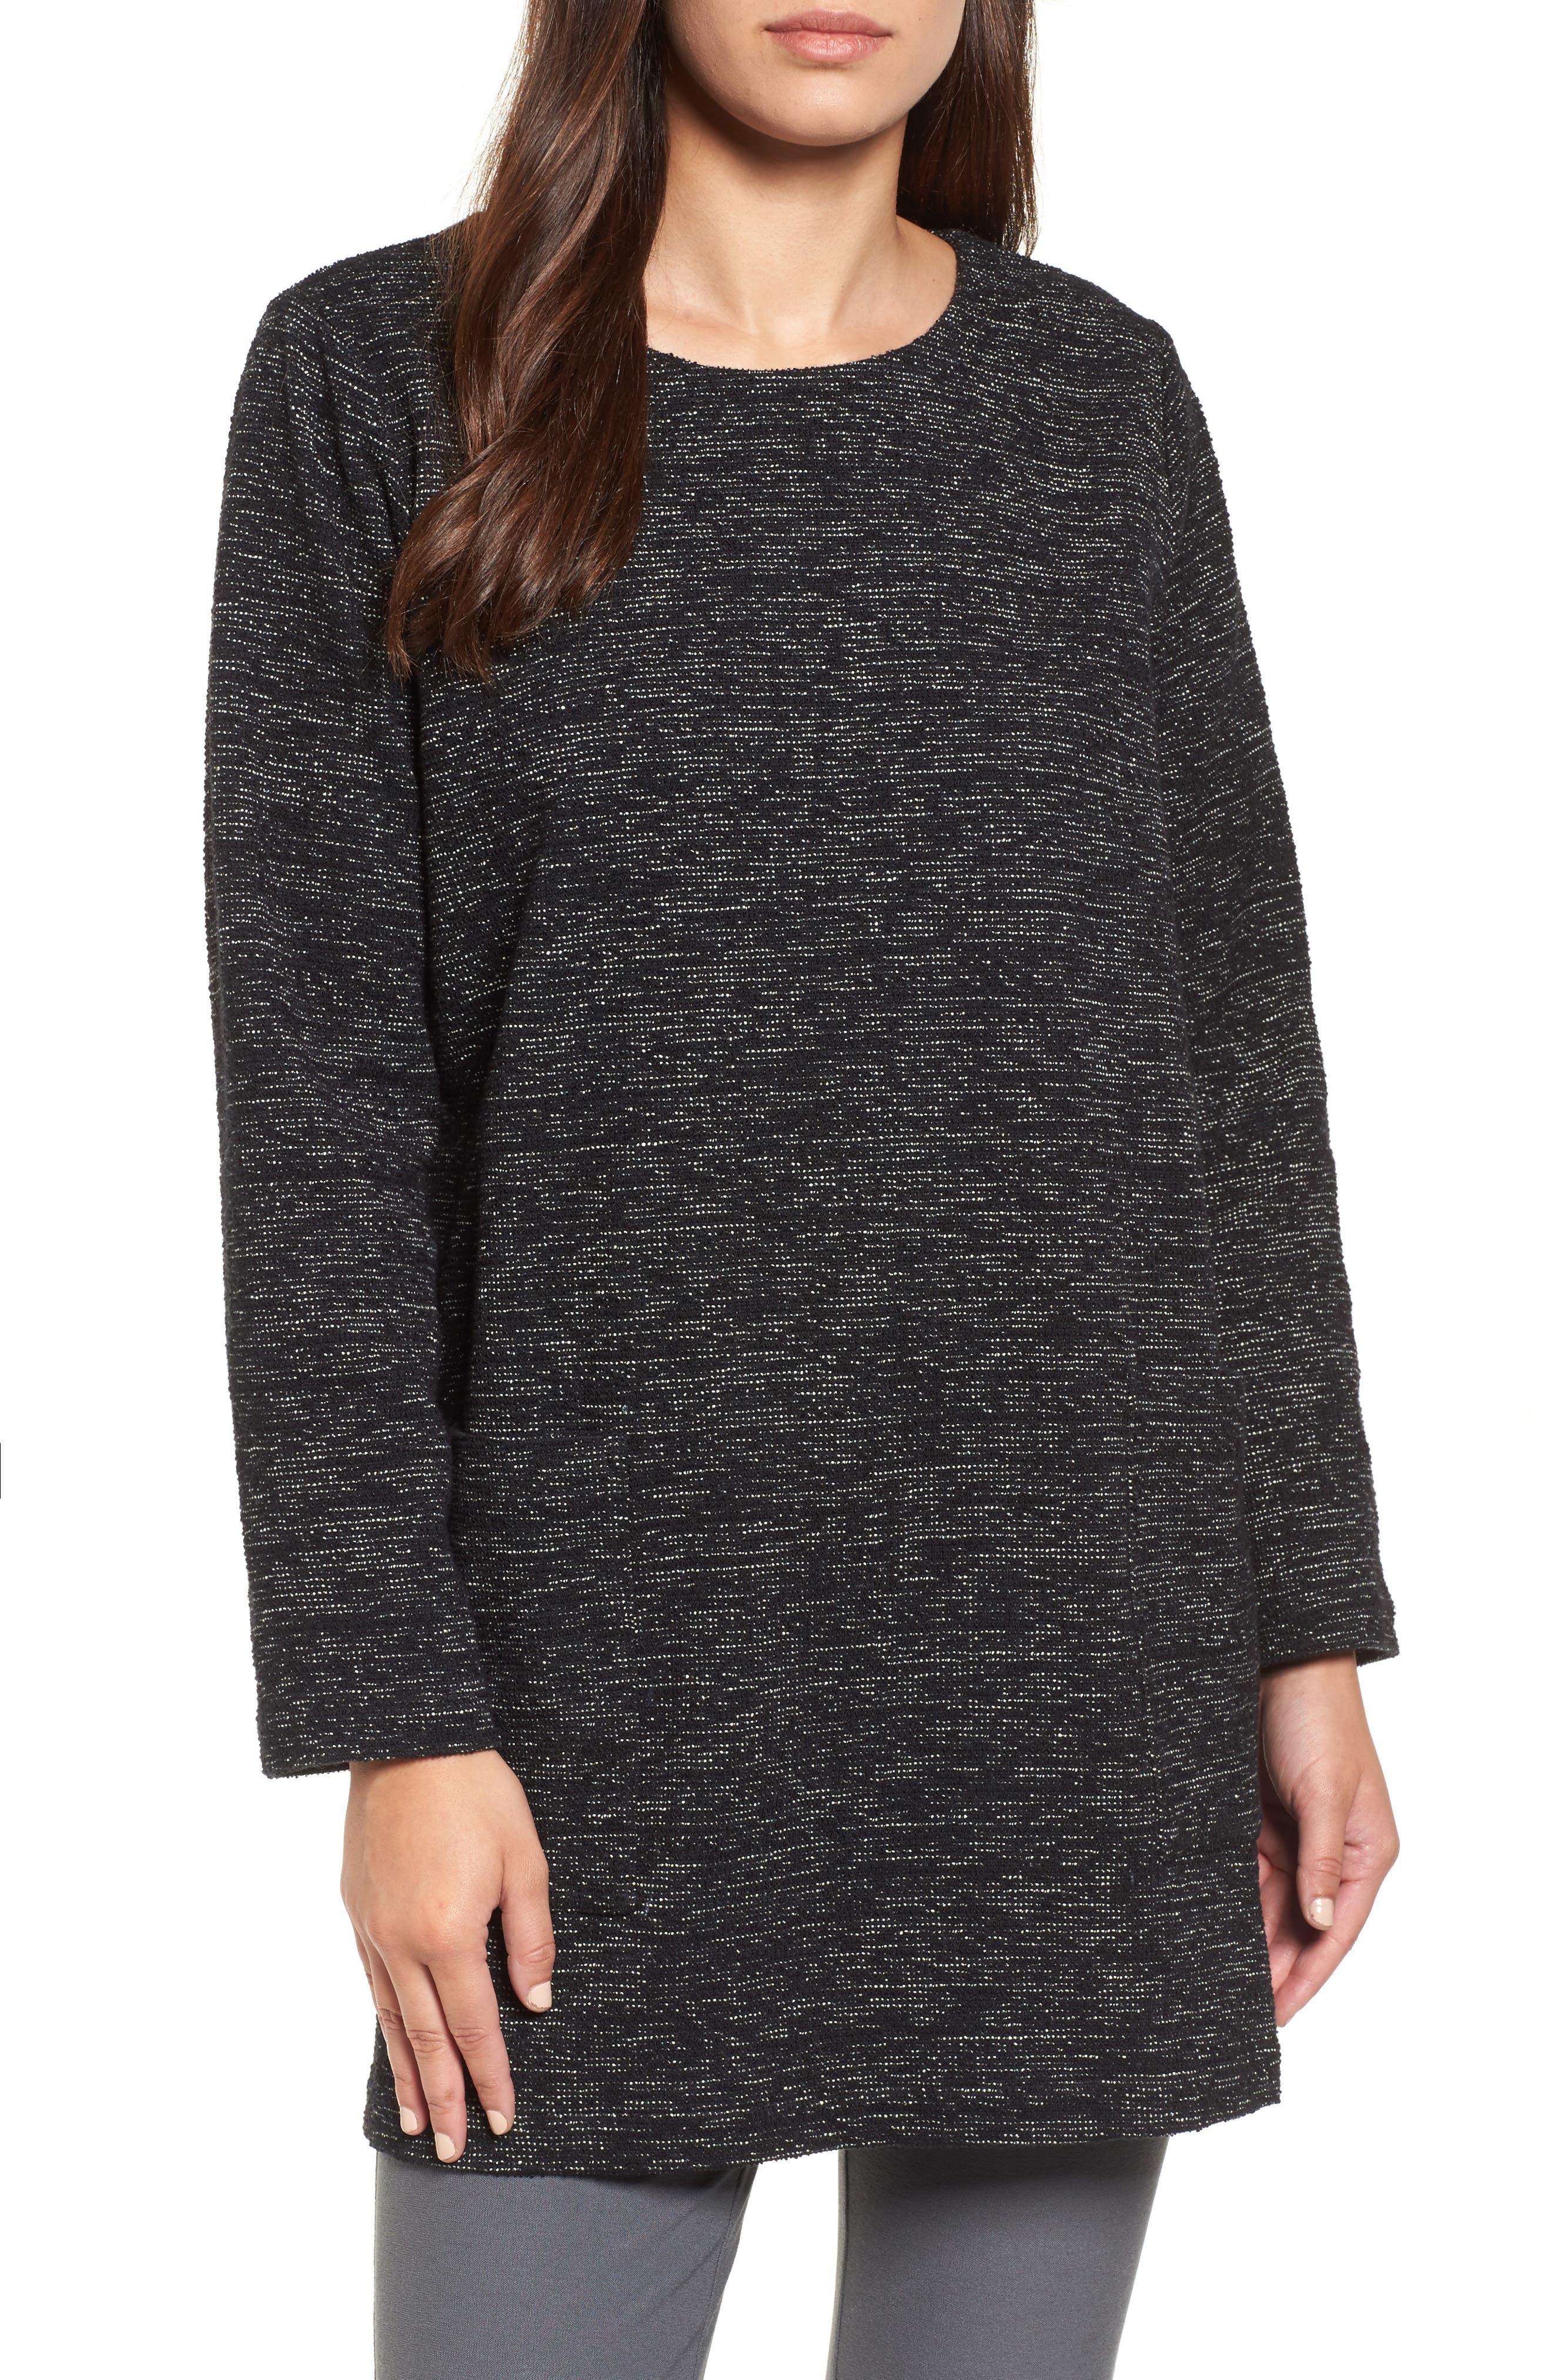 Boxy Organic Cotton Blend Tunic Sweater,                             Main thumbnail 1, color,                             001